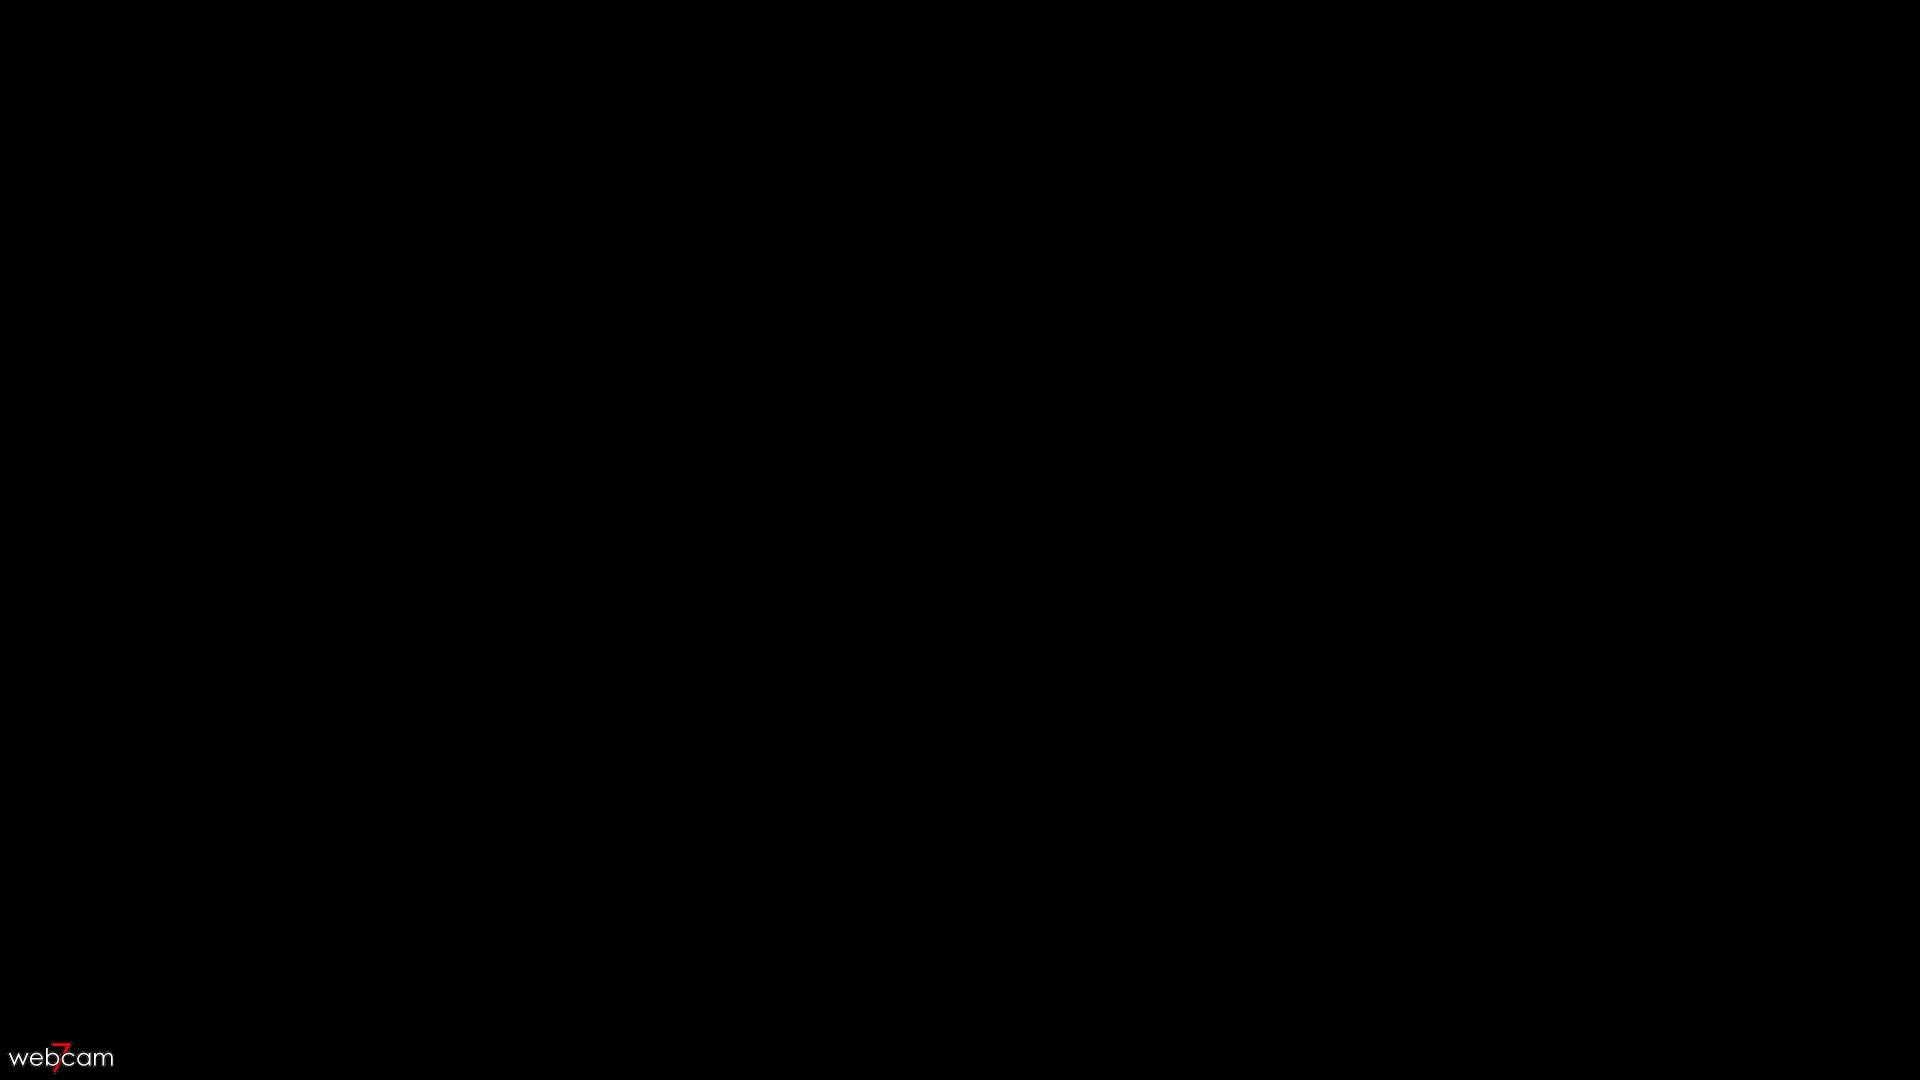 wettecom